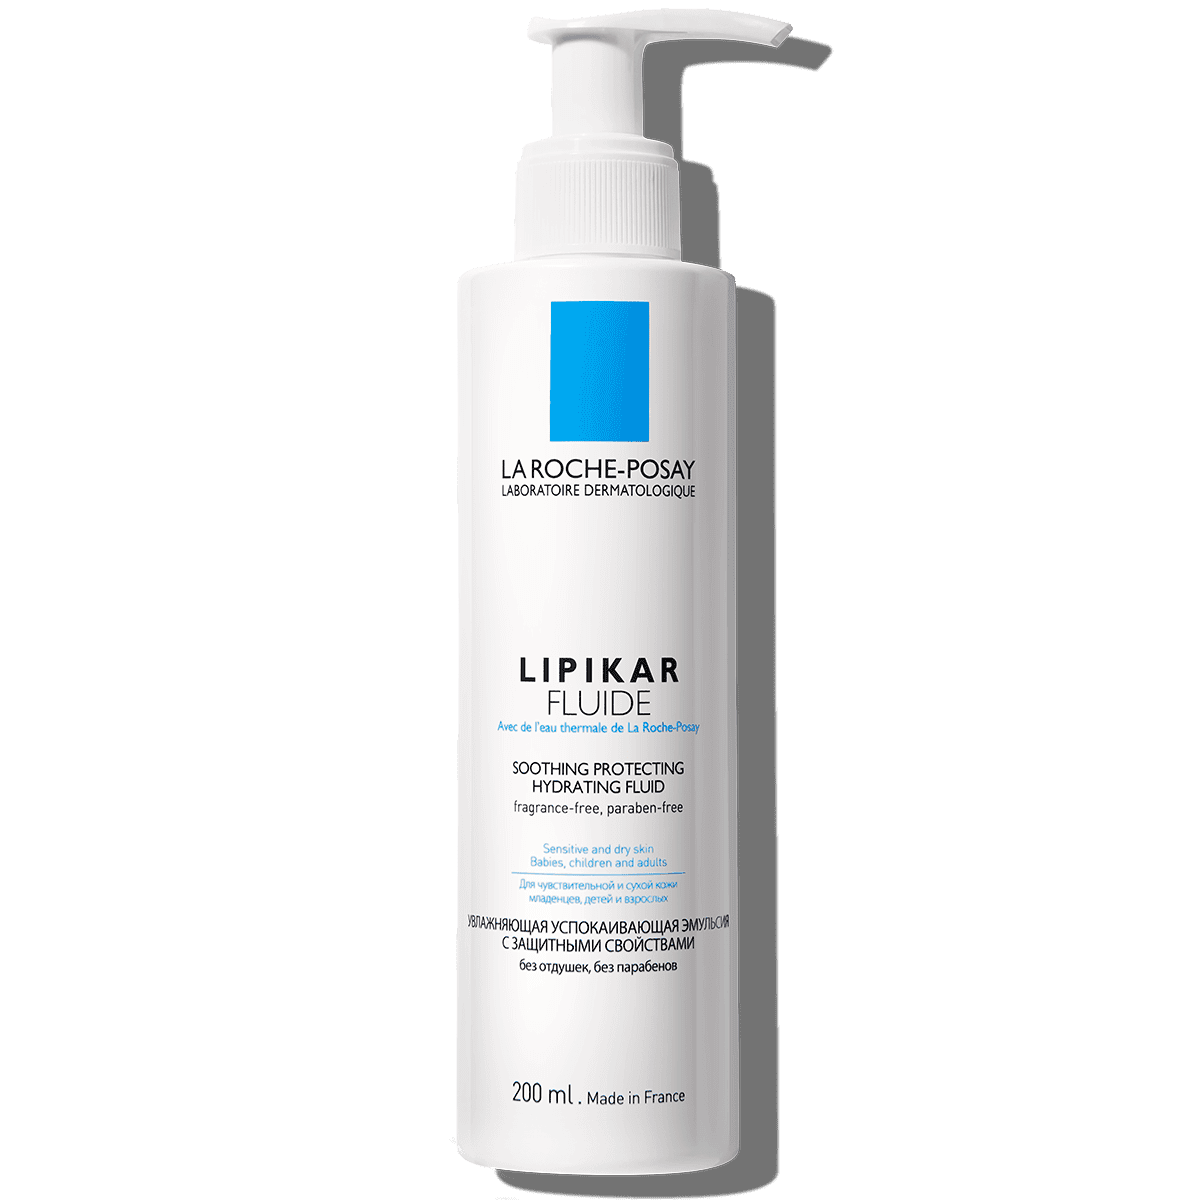 La Roche Posay Produktsida Eczema Lipikar Fluide 200ml 3337872420603